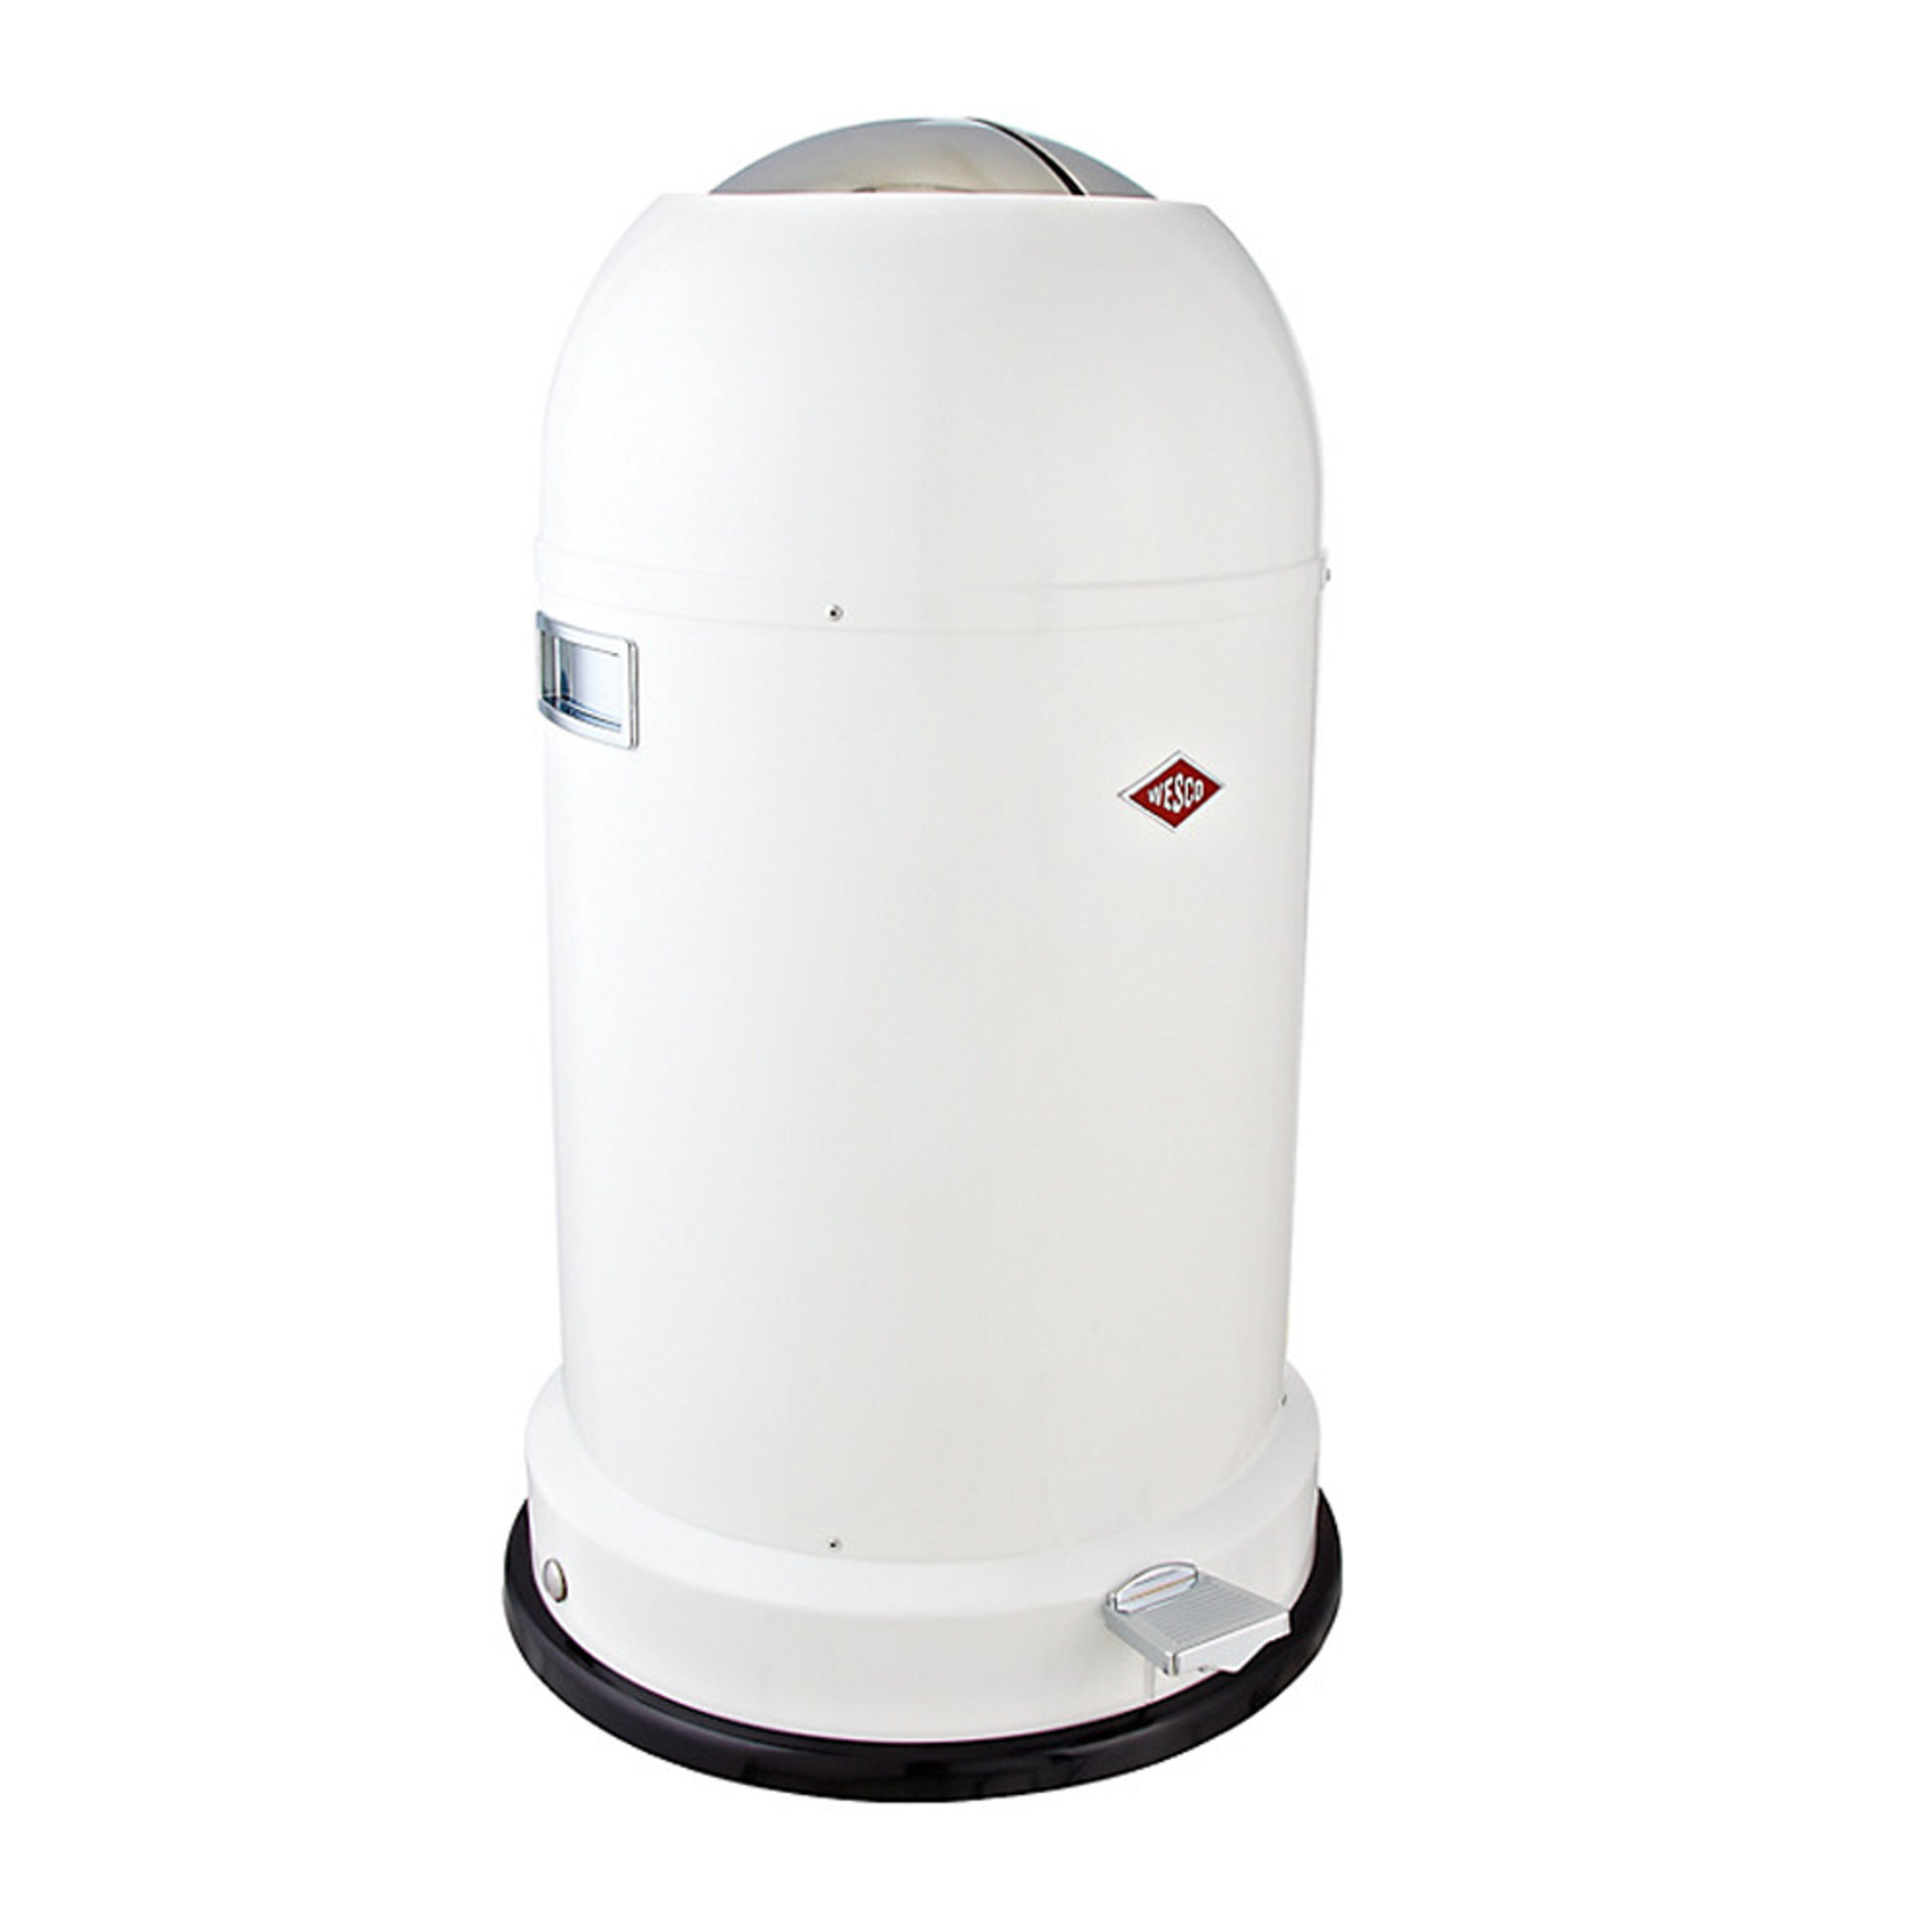 Wesco 33 liter Kickmaster Soft